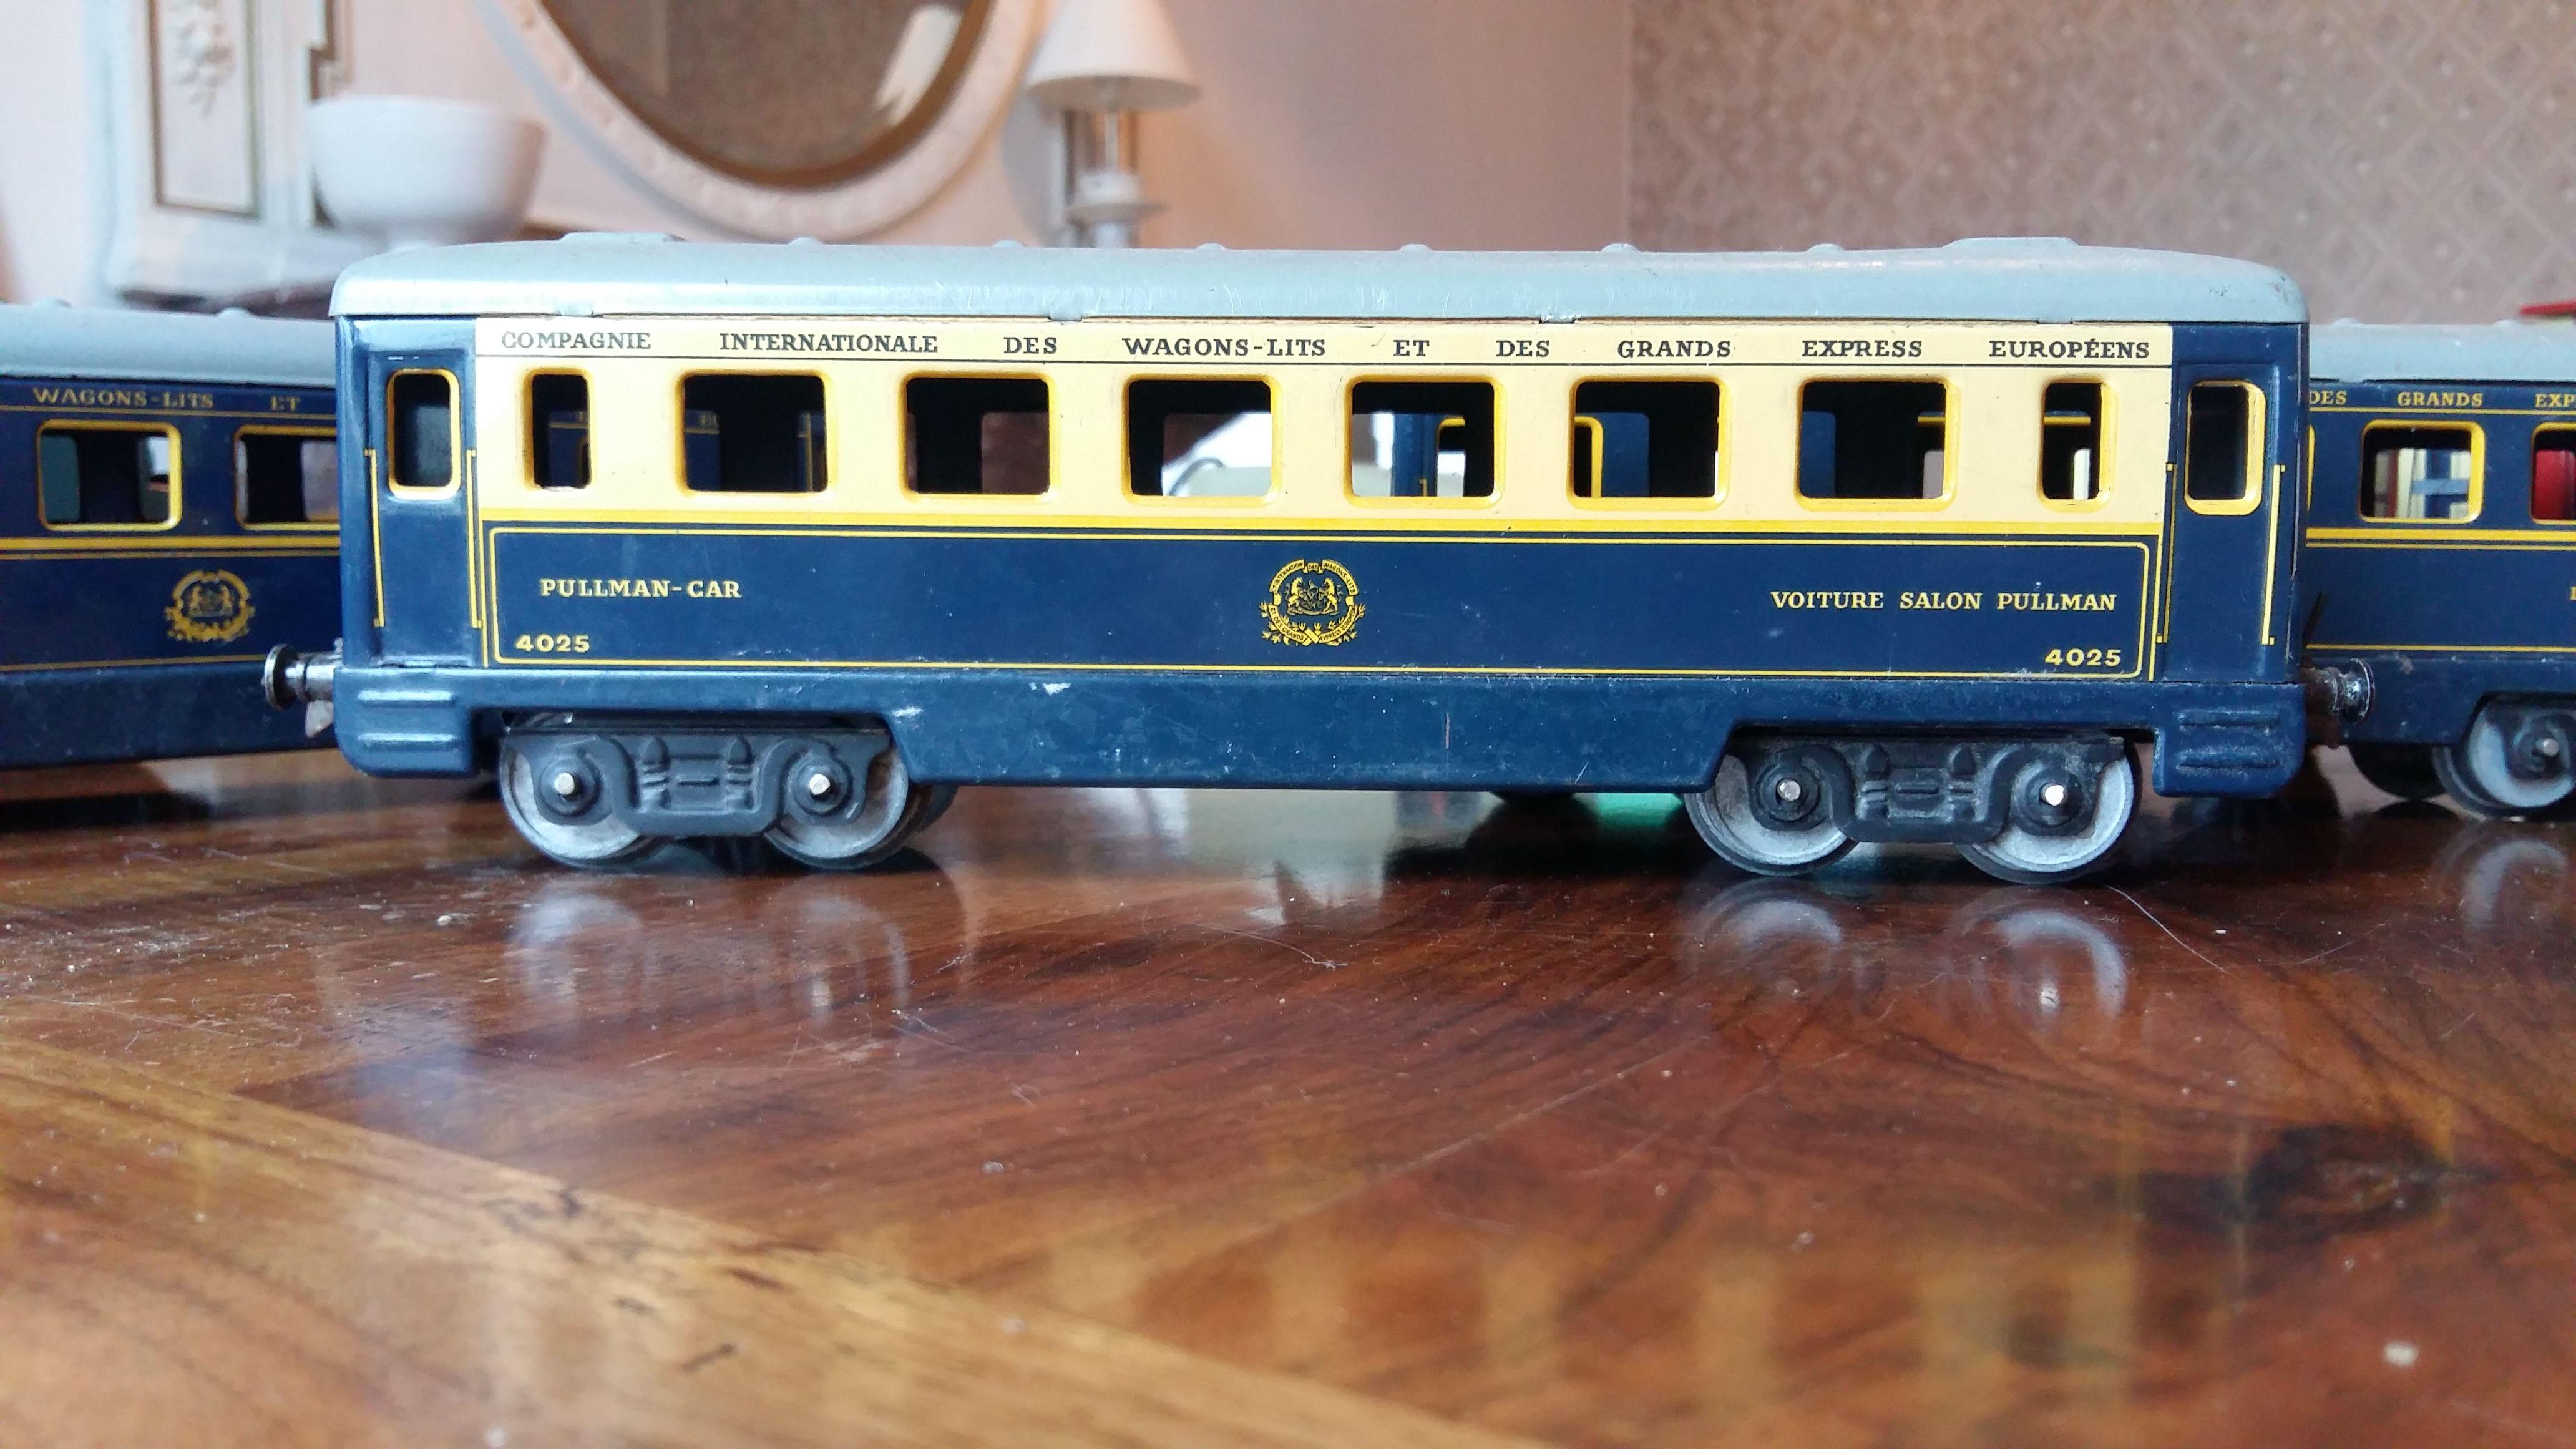 TRAIN HORNBY AVEC RAILS